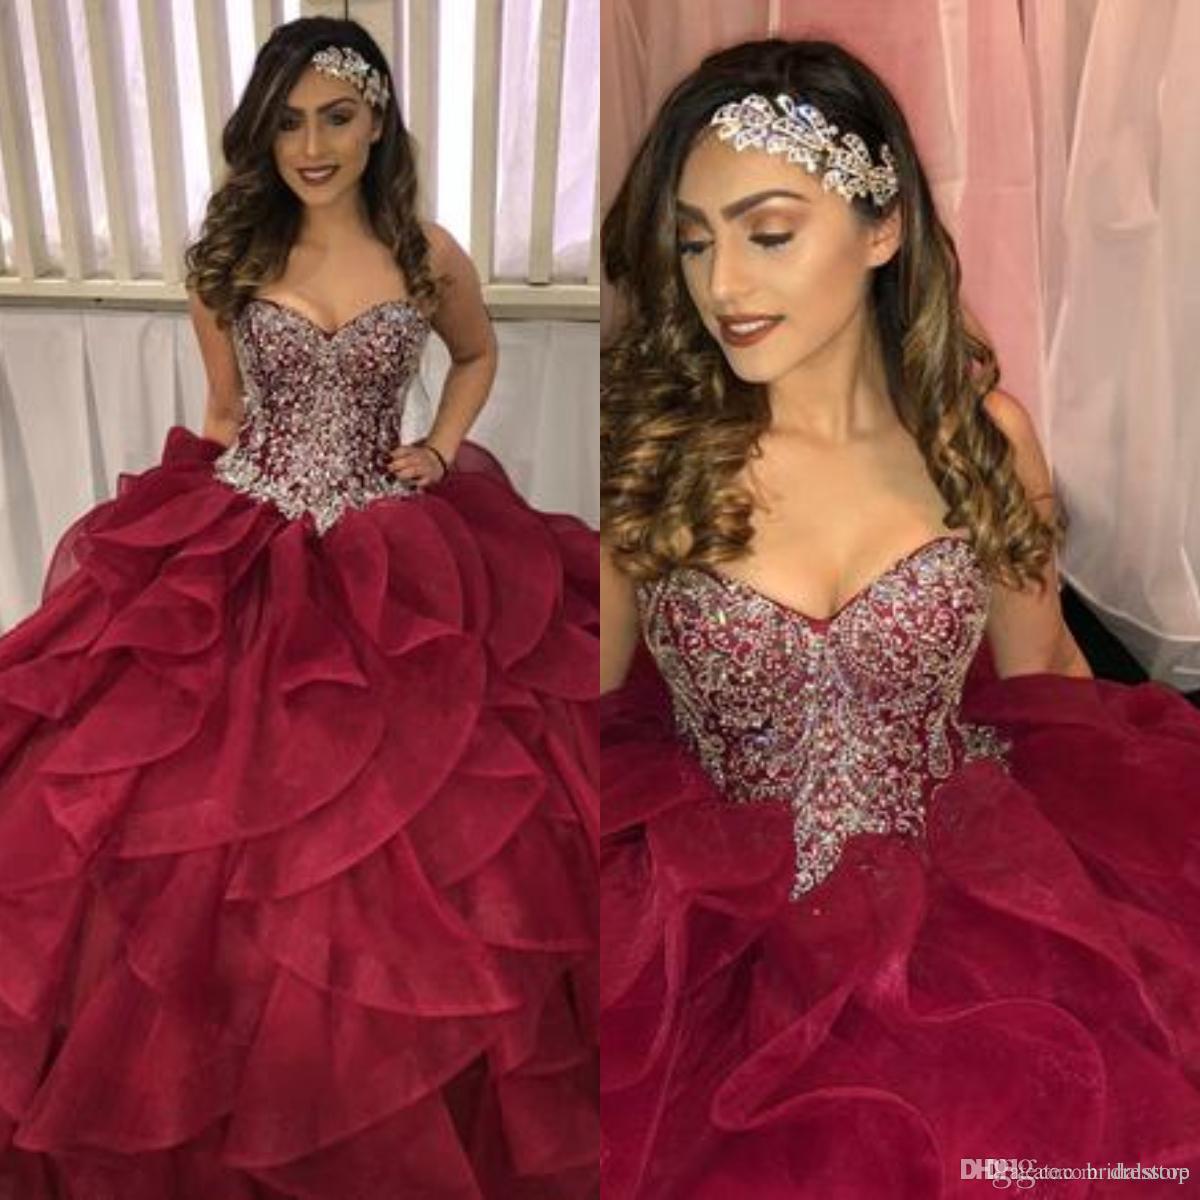 69679844579 Vintage Burgundy Ball Gown Quinceanera Dresses Sweetheart Organza Ruffles  Cascade Prom Dress 2019 Top Beaded Corset Vestidos 15 Anos Planning A  Quinceanera ...